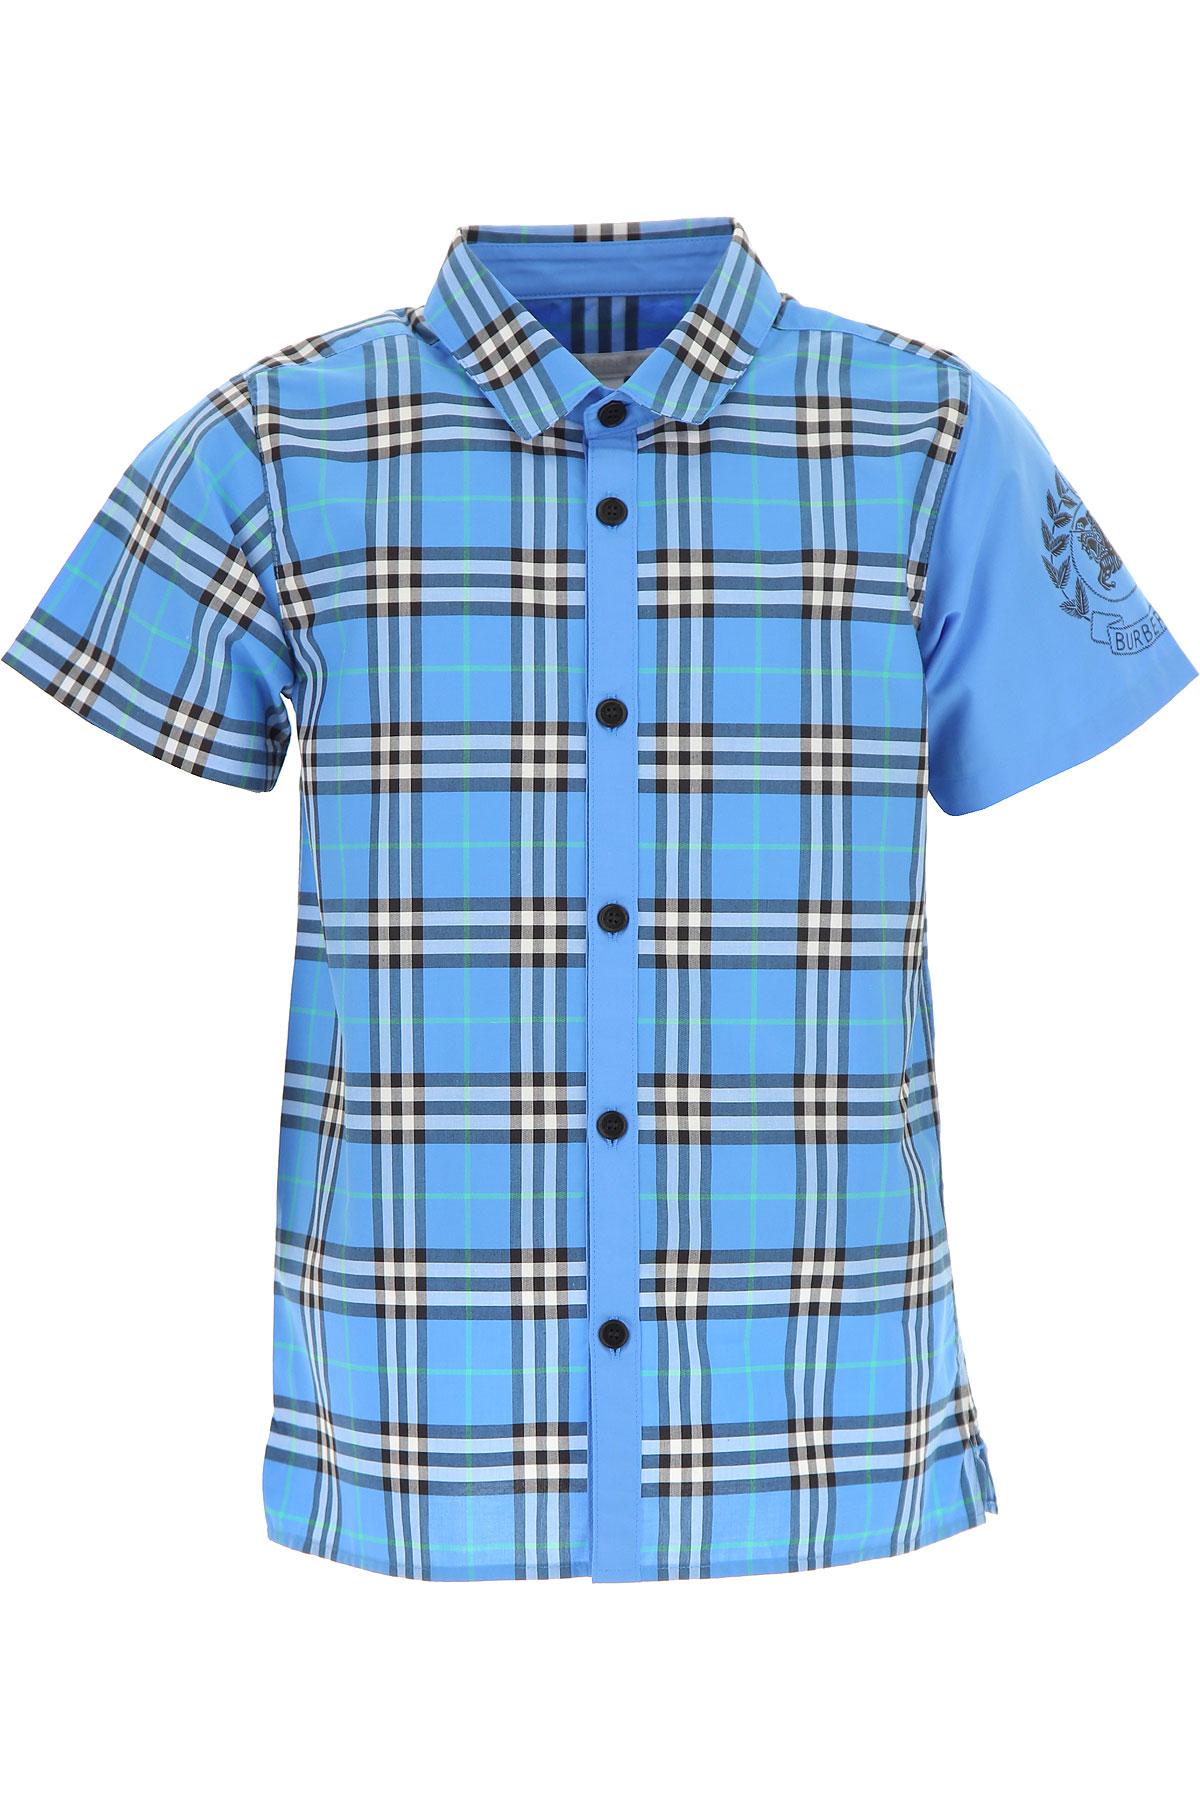 Image of Burberry Kids Shirts for Boys, Azure Blue, Cotton, 2017, 10Y 14Y 4Y 6Y 8Y